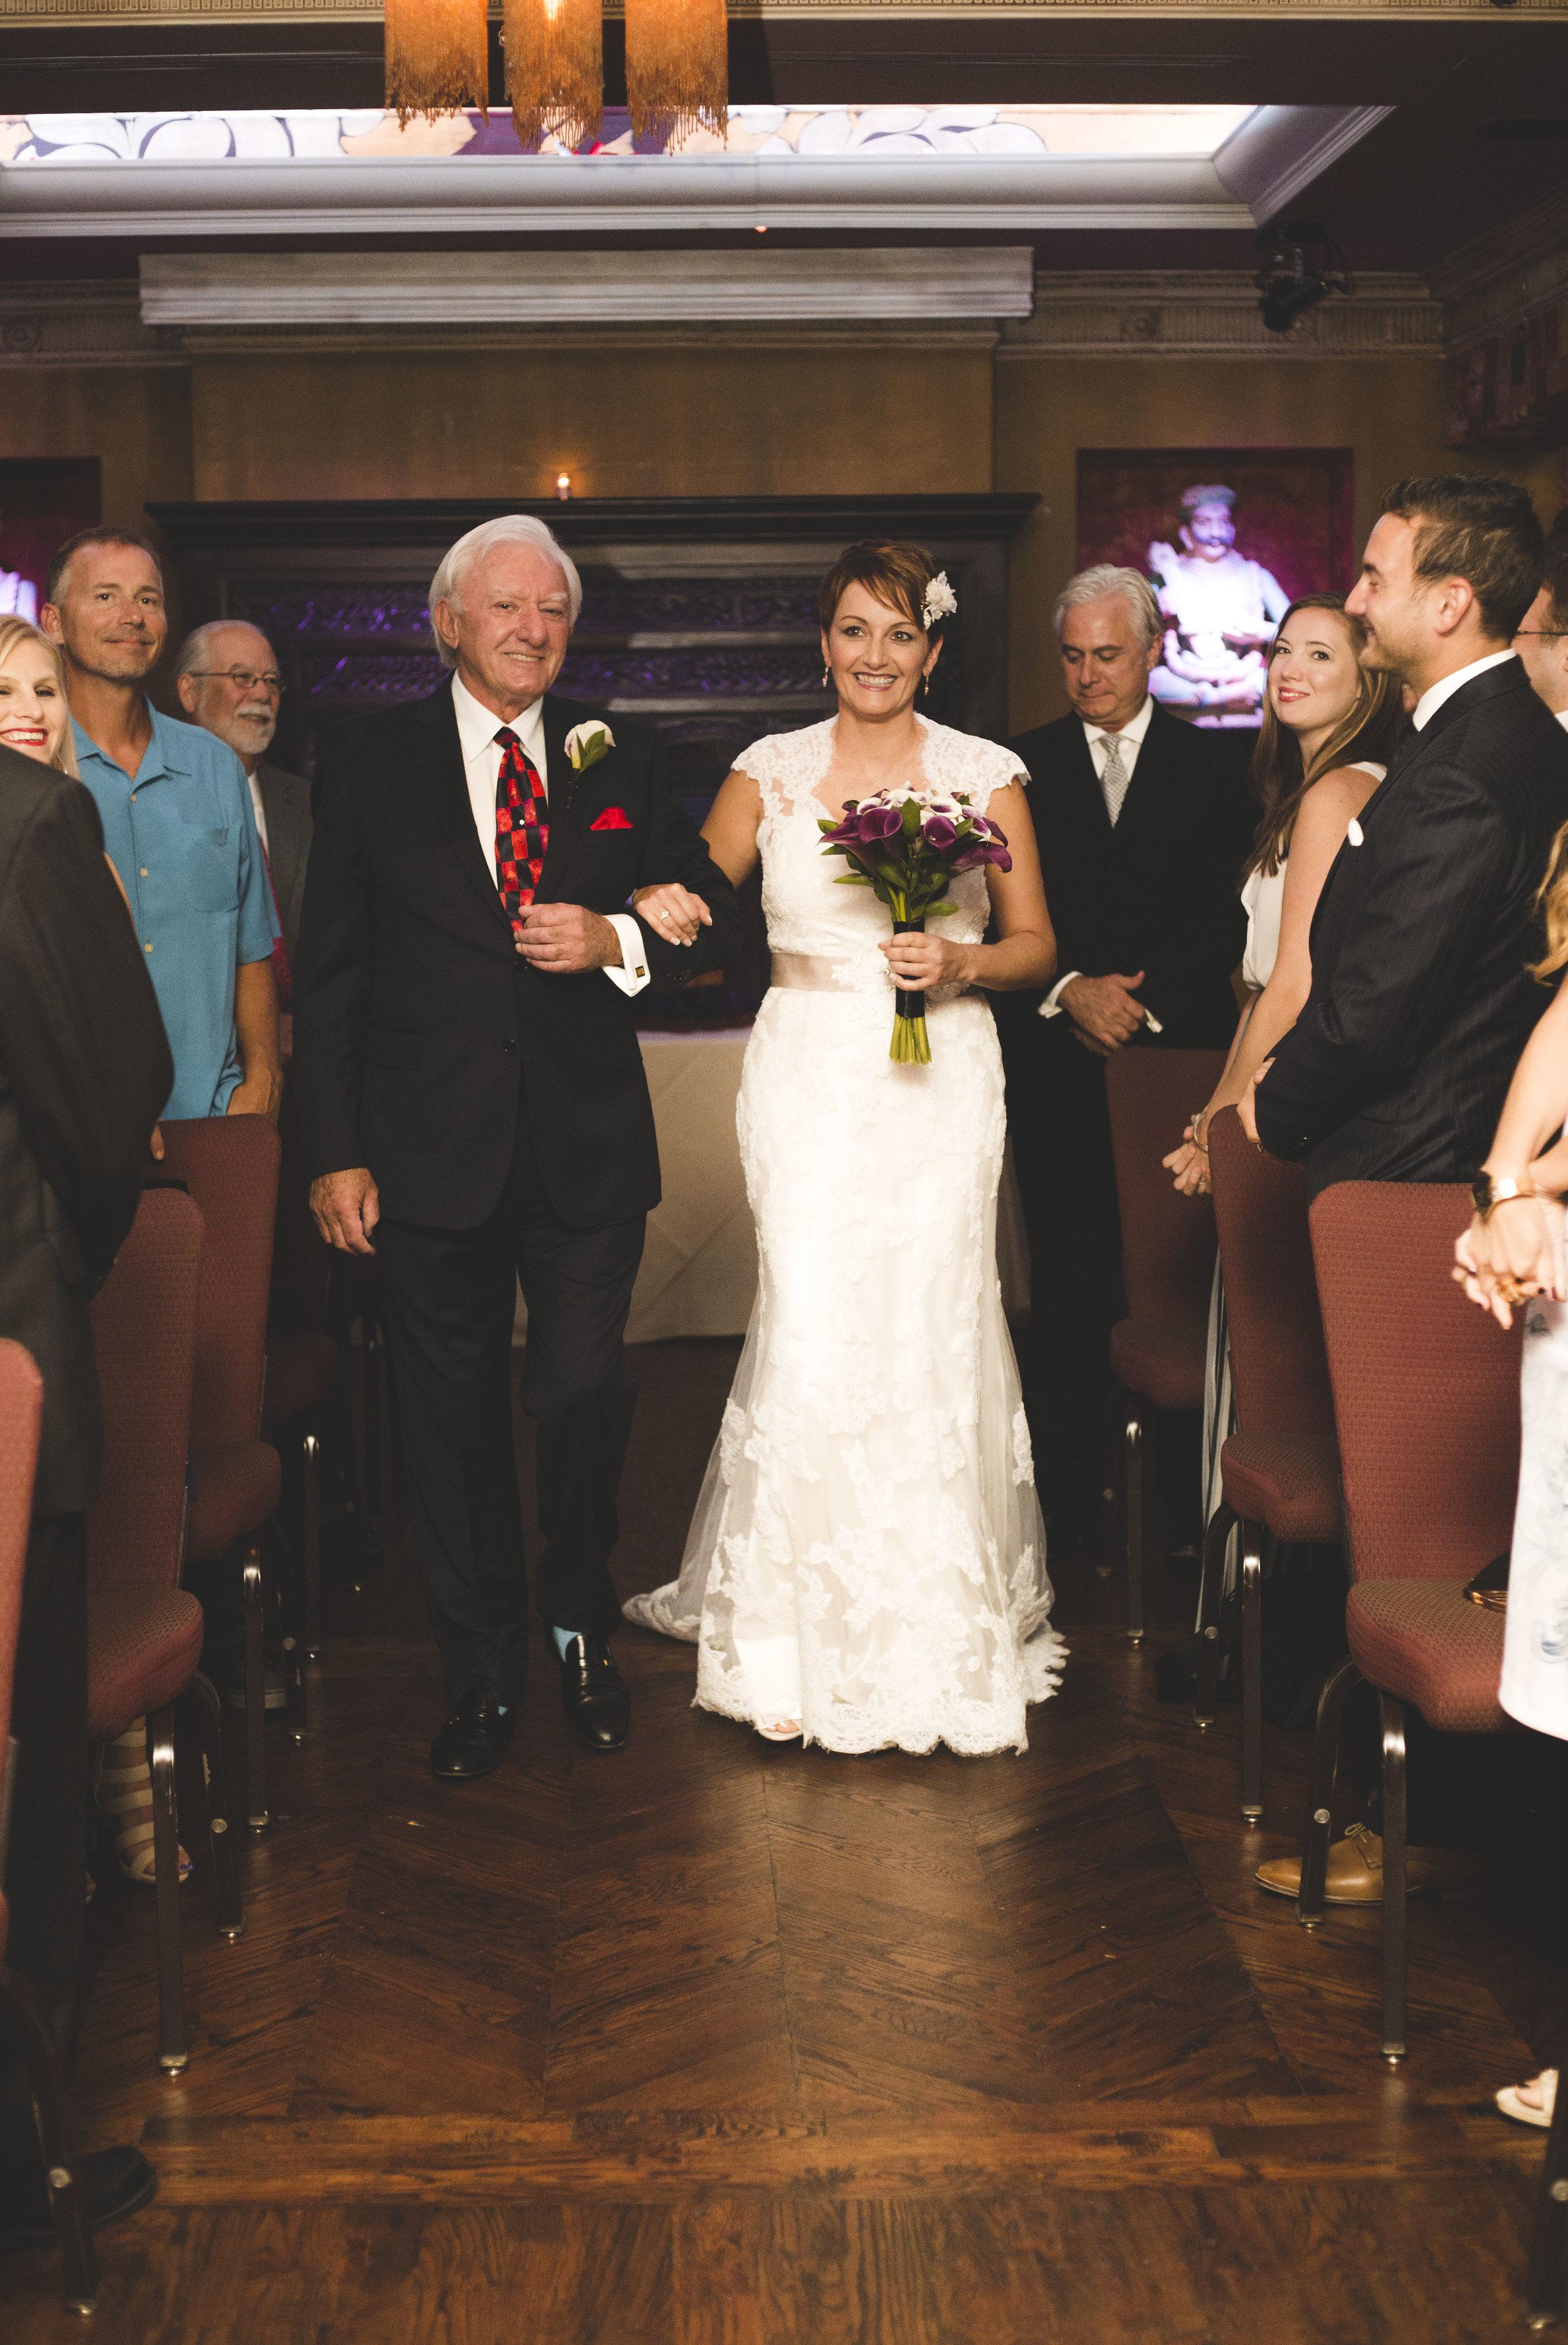 ATGI_Kat and Gabe Wedding 2016_2S8A5280.jpg